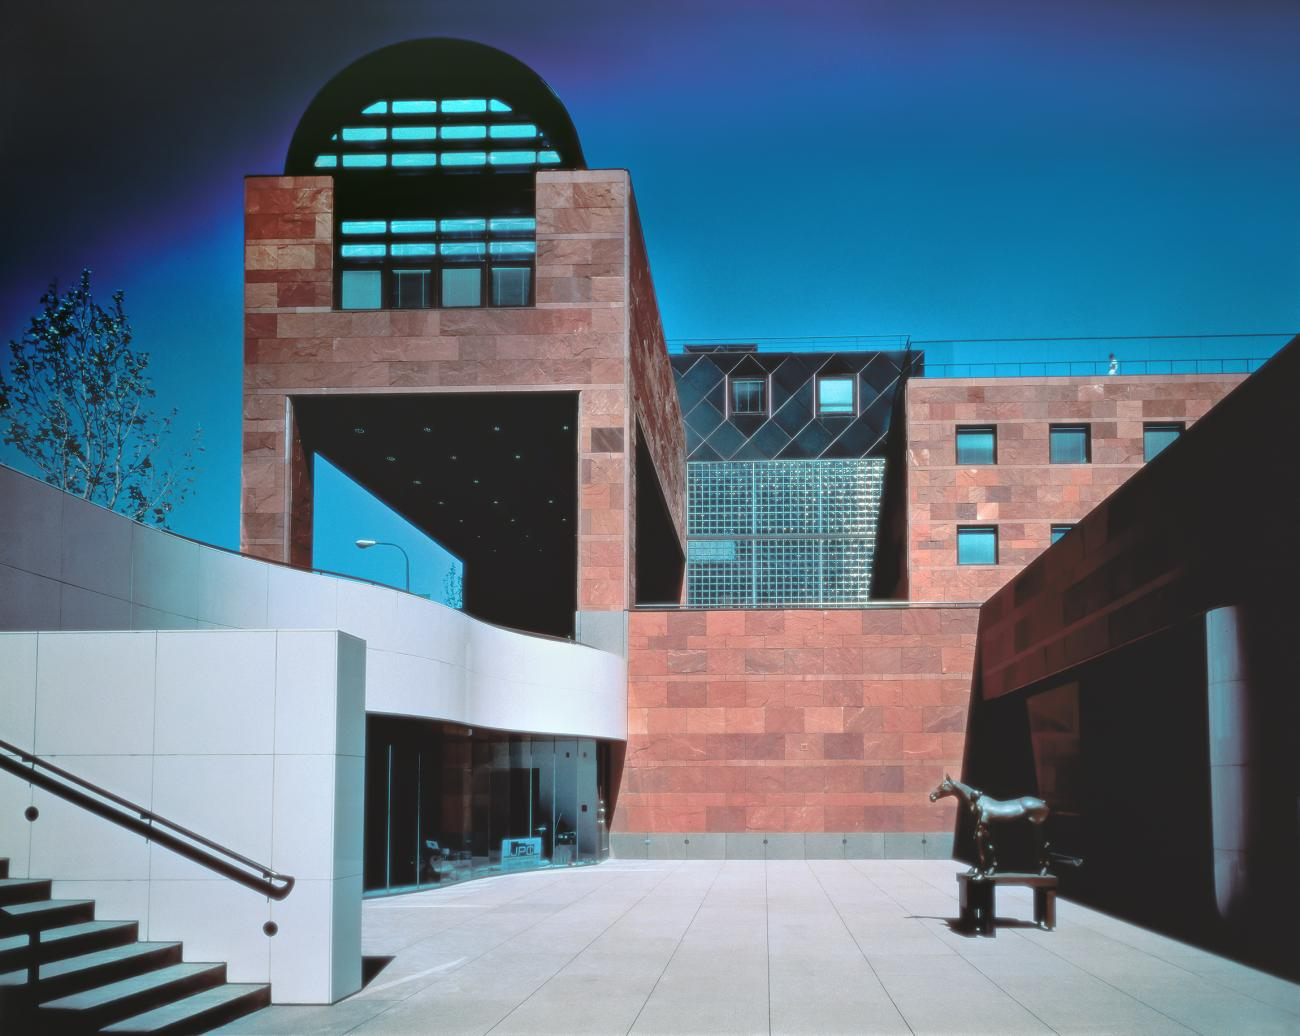 موزه هنر معاصر، لس آنجلس